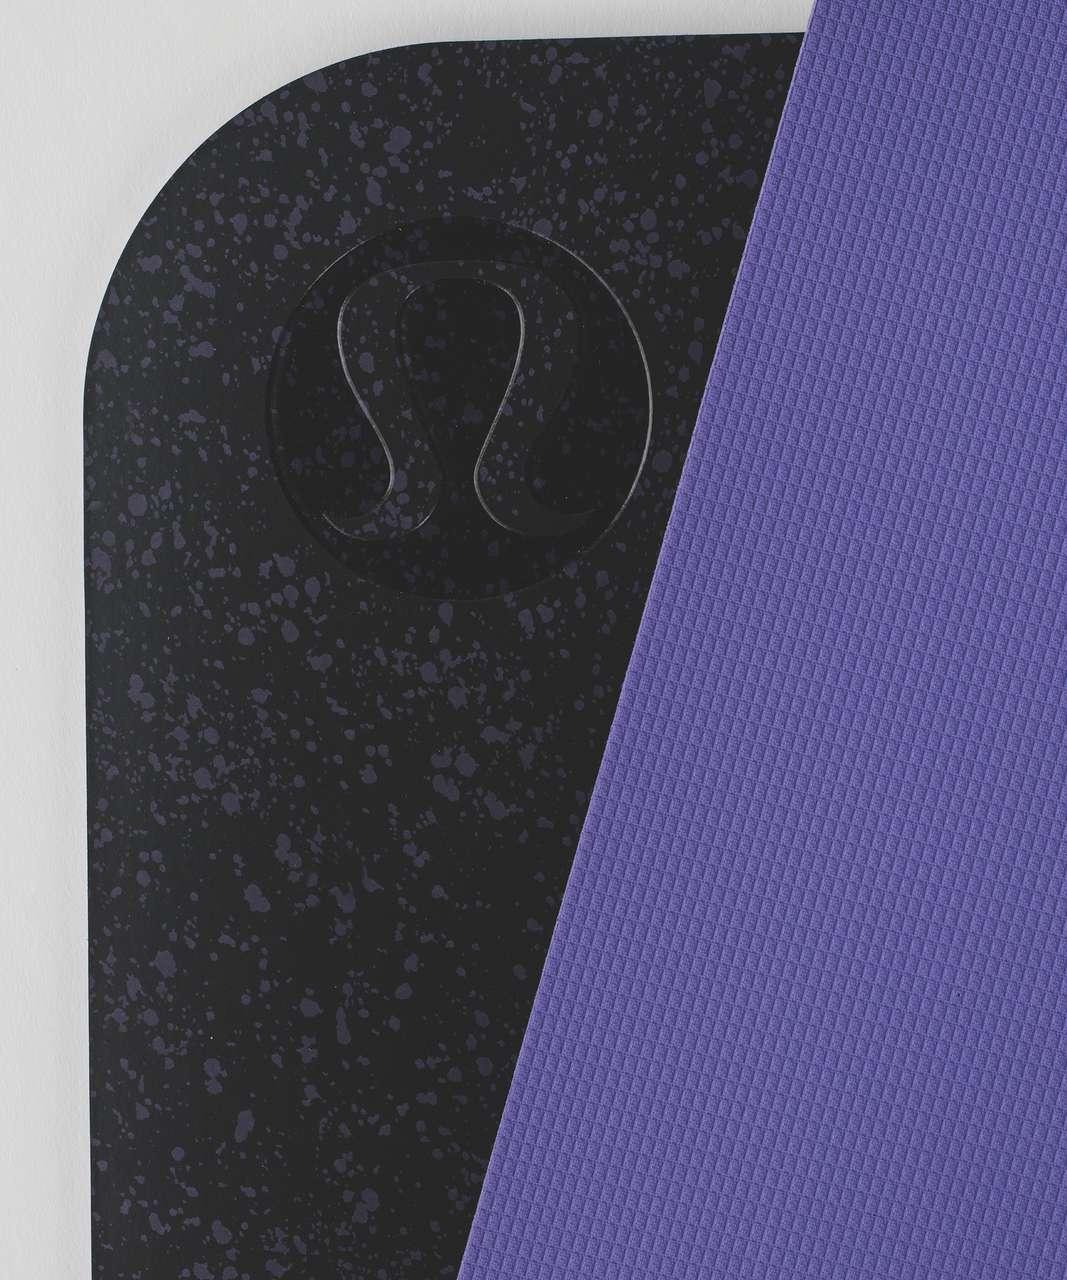 Lululemon The Reversible Mat 5mm - Splatter Black Power Purple Big / Power Purple